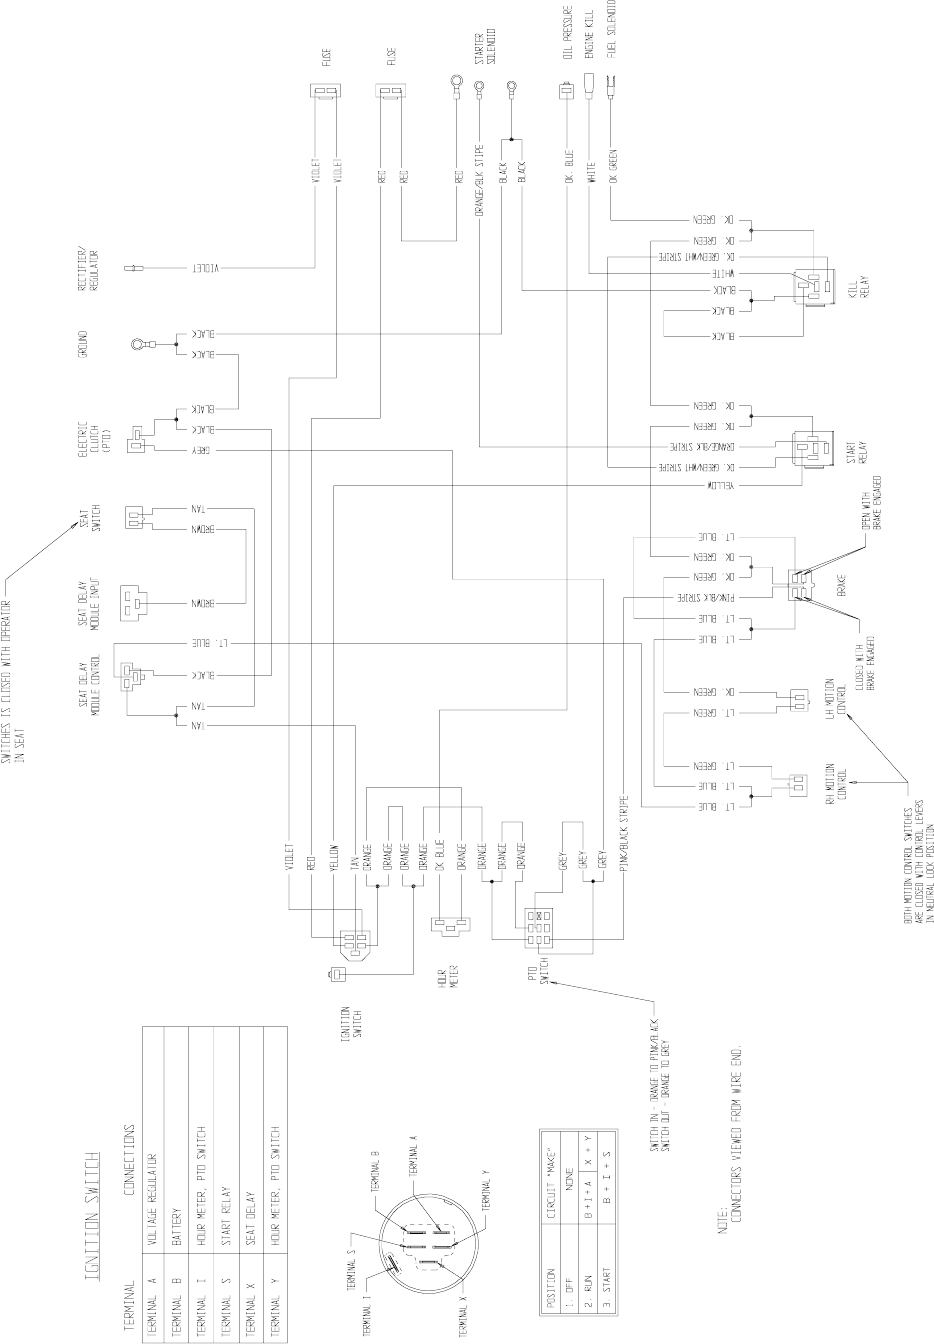 BL_1419] Exmark Lazer Wiring Diagram Download DiagramRucti Ww Blikvitt Librar Wiring 101